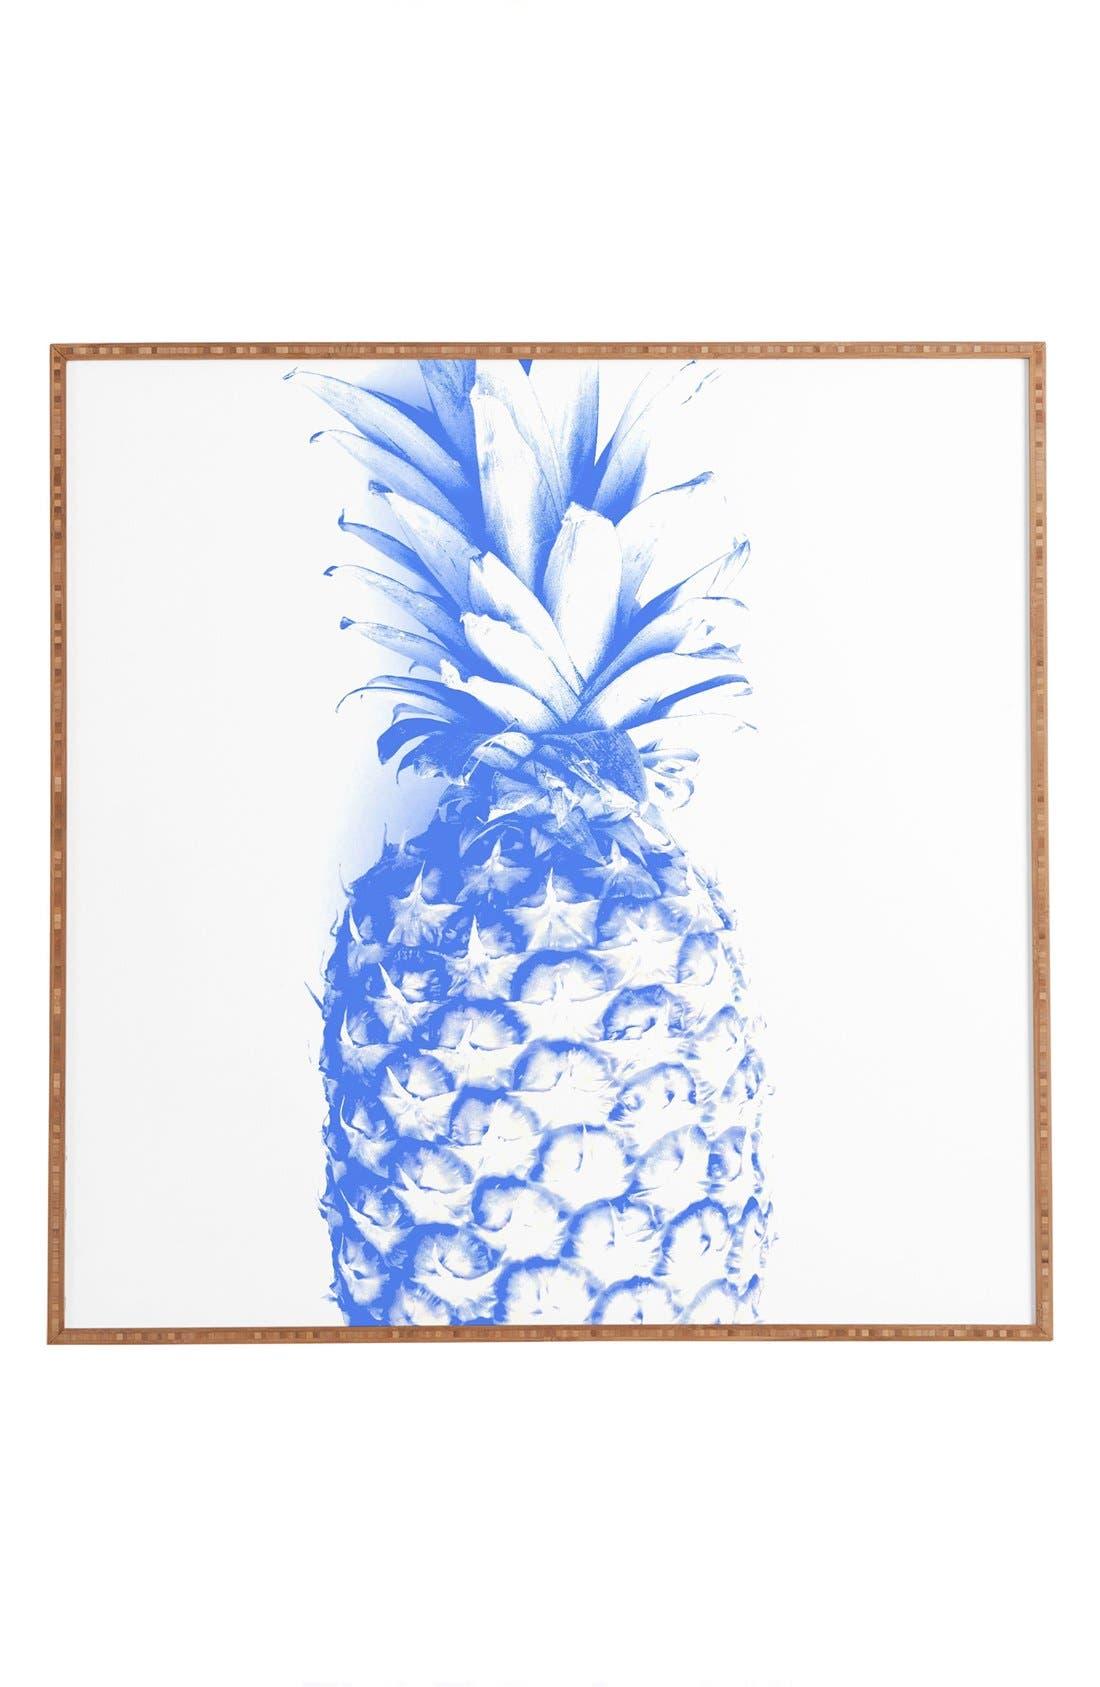 Alternate Image 1 Selected - DENY Designs 'Pineapple' Framed Wall Art